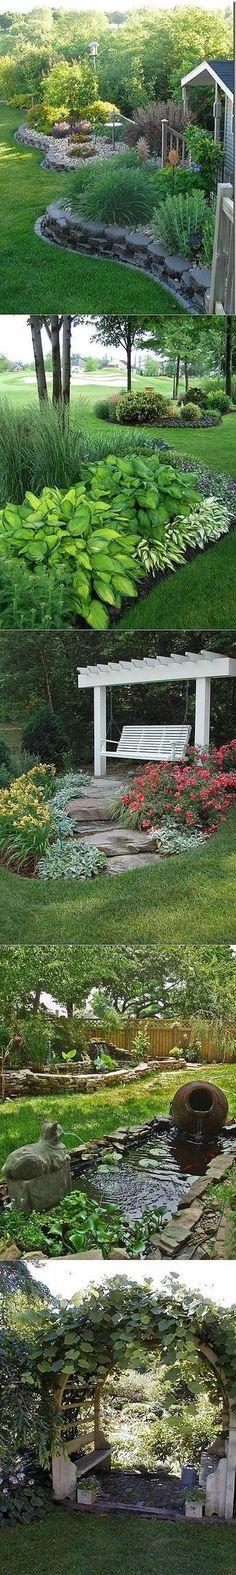 Ideas backyard shade plants garden ideas for 2019 Backyard Shade, Shade Garden, Backyard Patio, Backyard Plants, Wedding Backyard, Landscape Design, Garden Design, Urban Landscape, Front Yard Landscaping